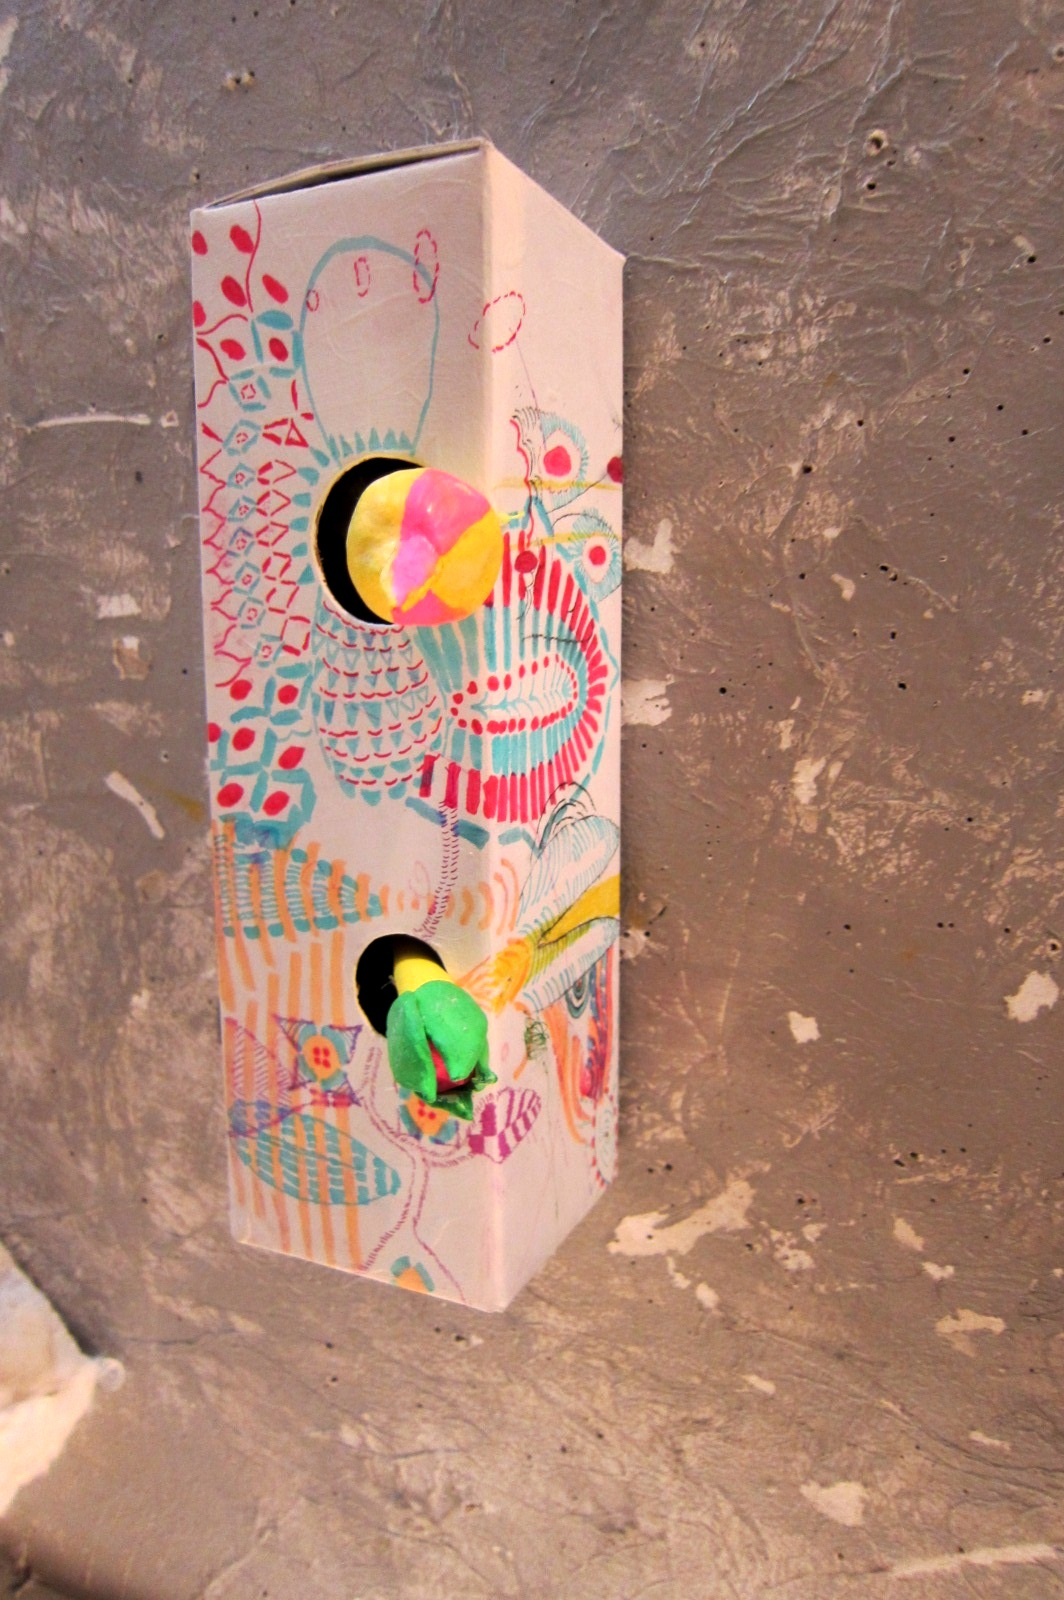 2020) 「jobin. とpaterの二人展 『ハルナデ展2013』」 ニュー・スター 4月15 日(月)~4月29日(日)  _f0126829_1201567.jpg